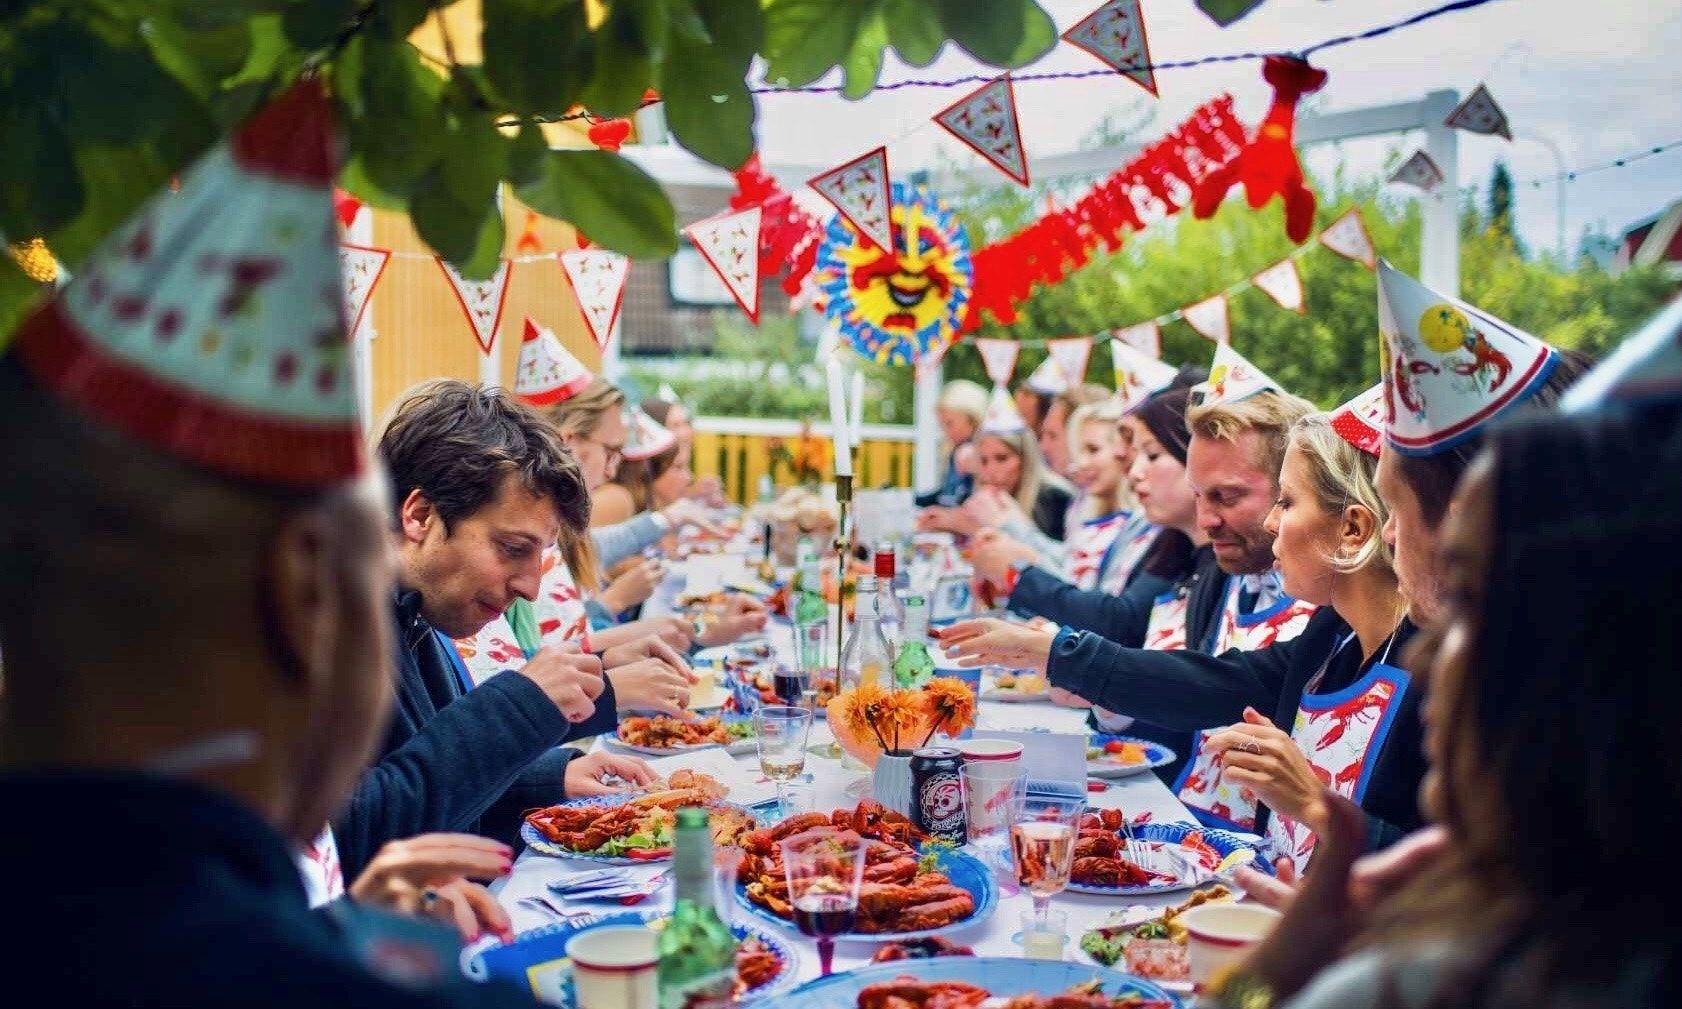 SwedCham's Tradition – Swedish Crayfish Party 2020: 11 September 2020 (Shanghai)